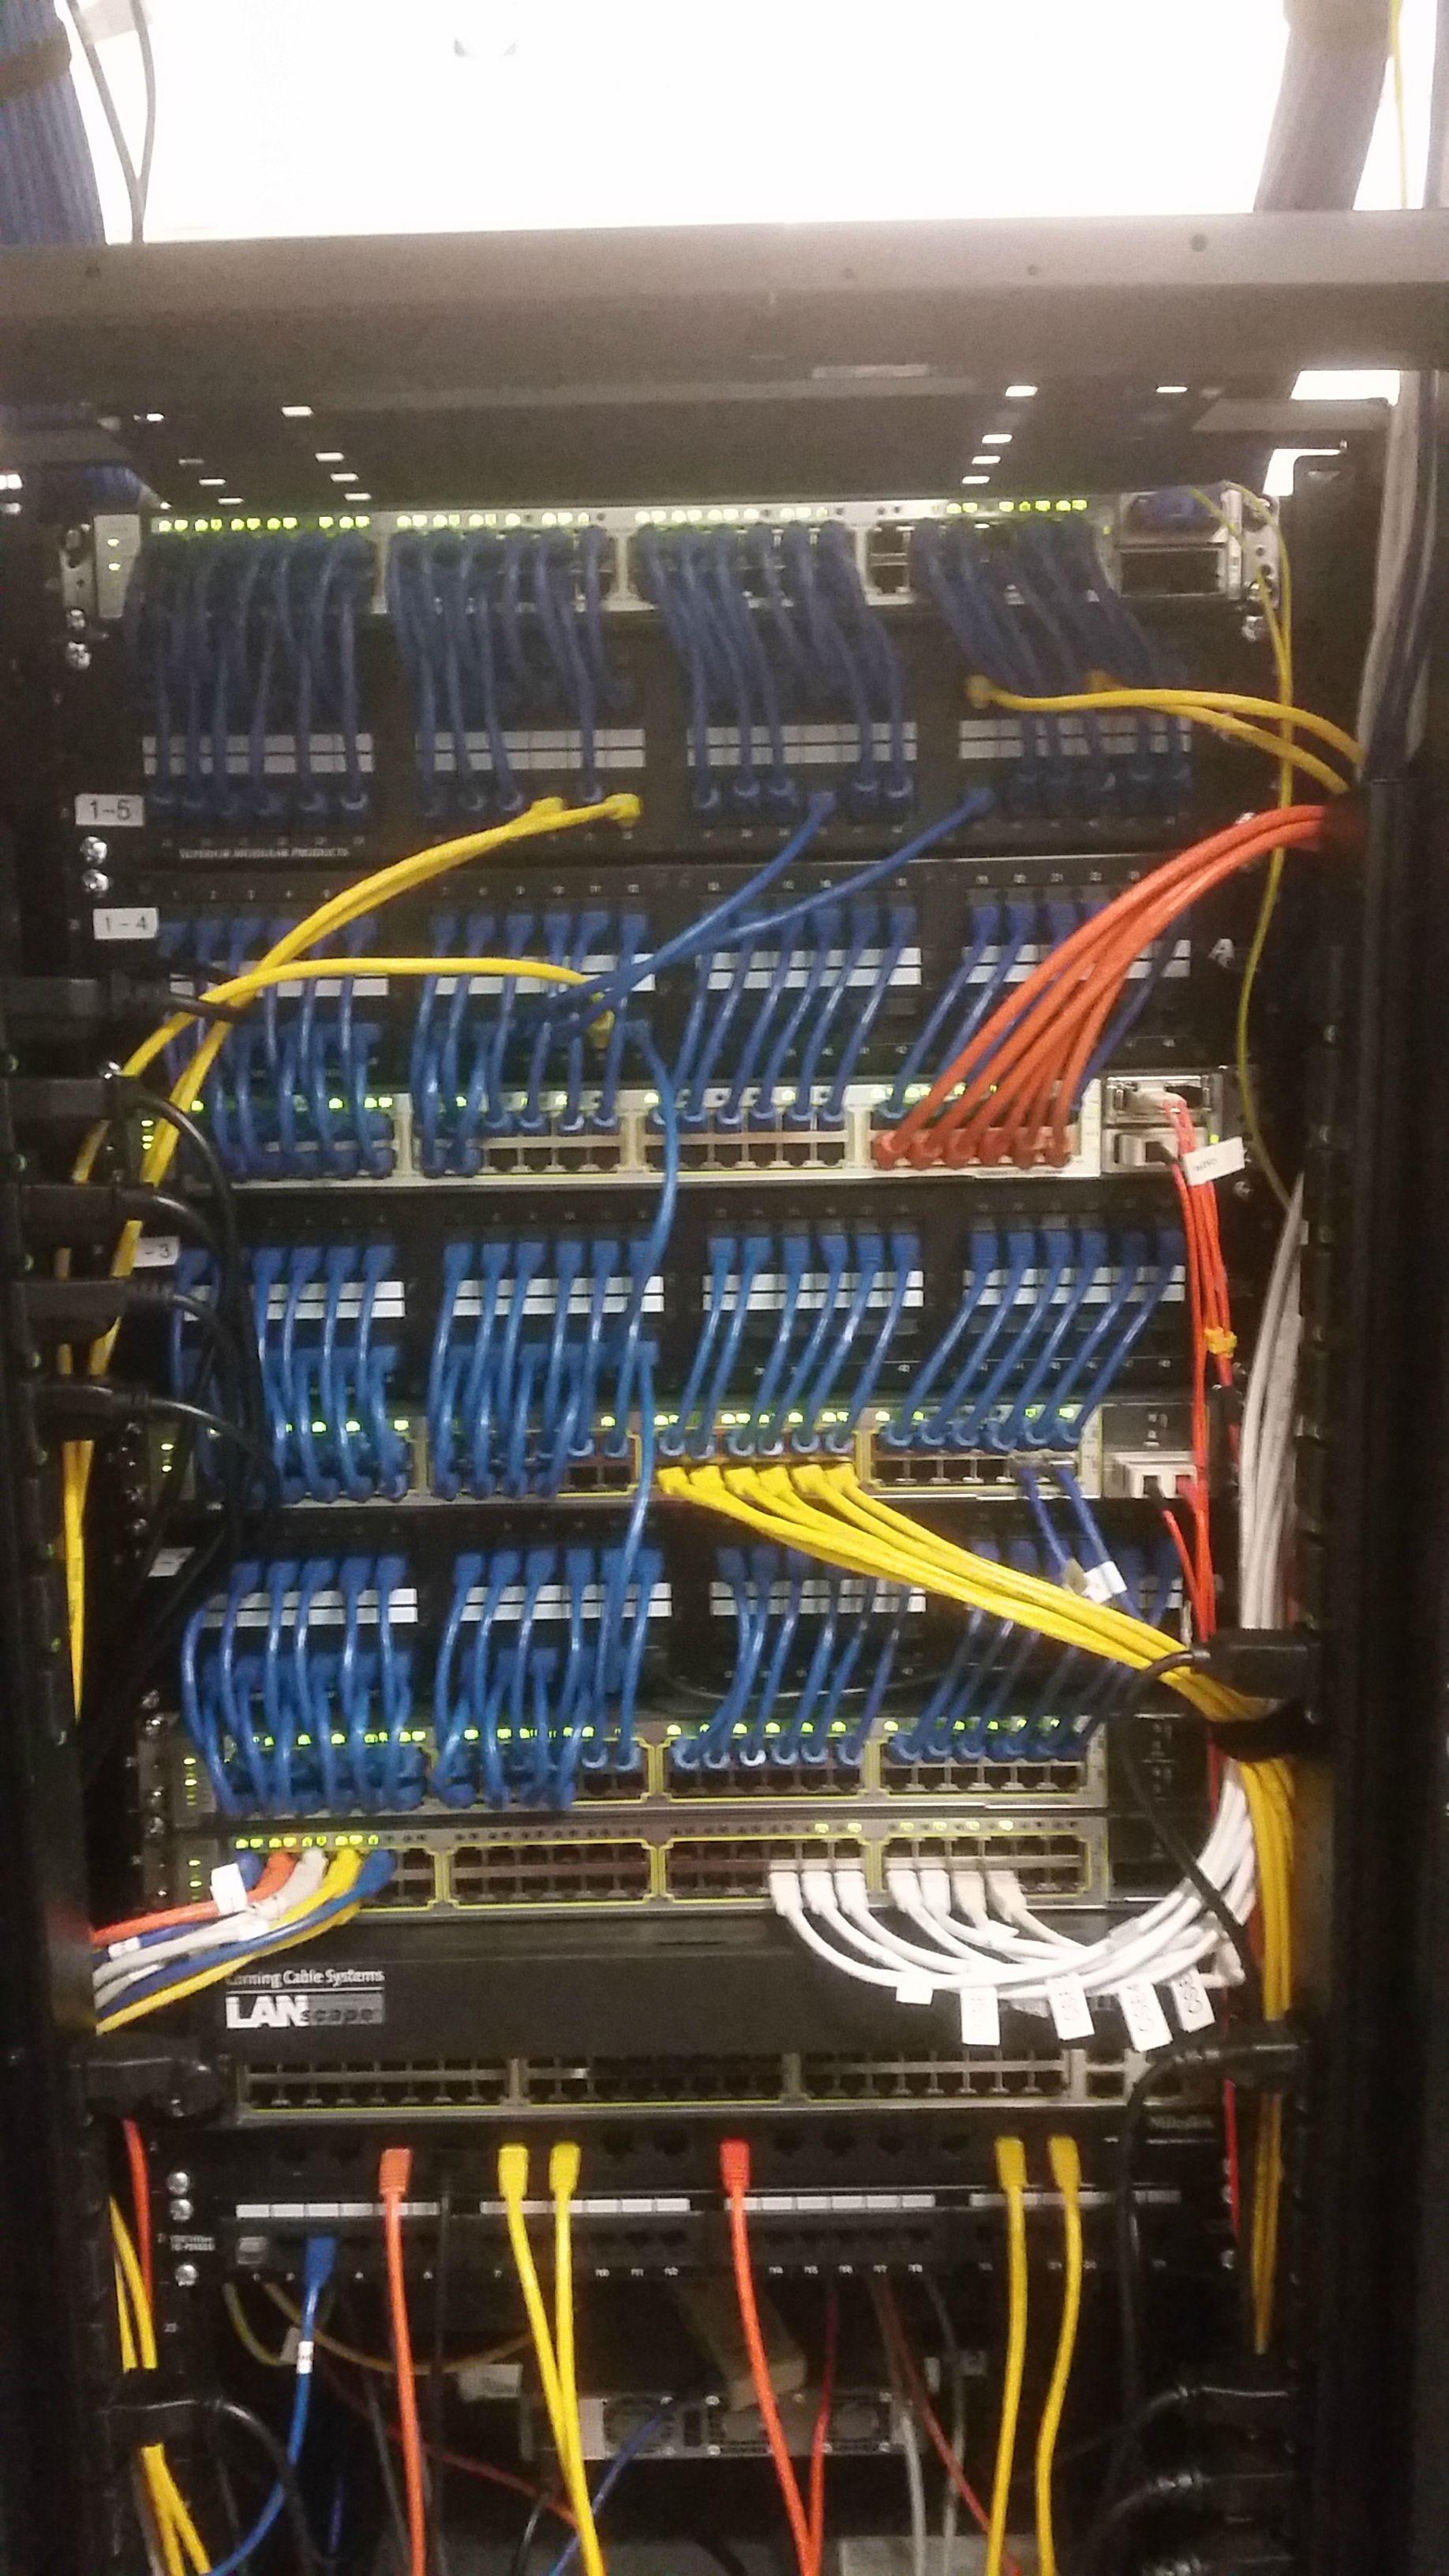 Wiring A Network Cabi | Online Wiring Diagram